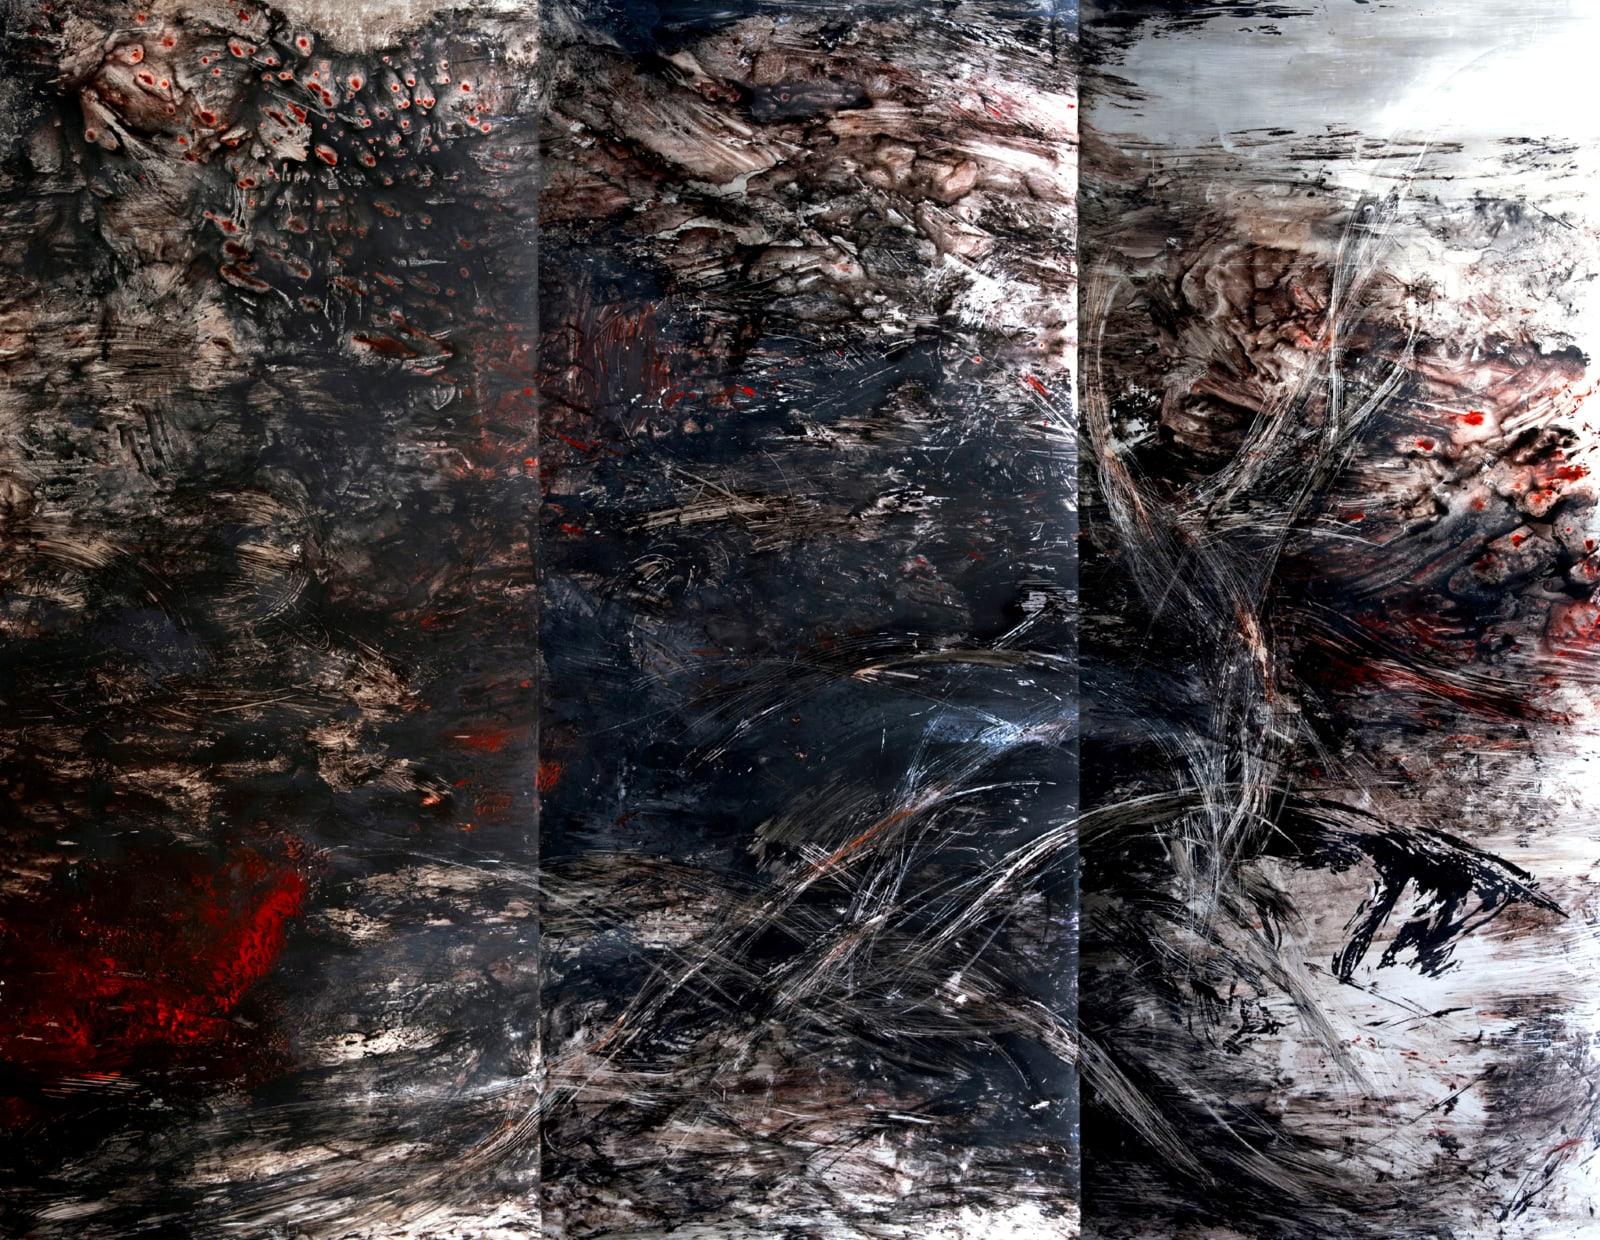 C. N. Liew 劉慶倫, Border XIV -- Aesthetic 臨界之十四 -- 意向萬千, 2020